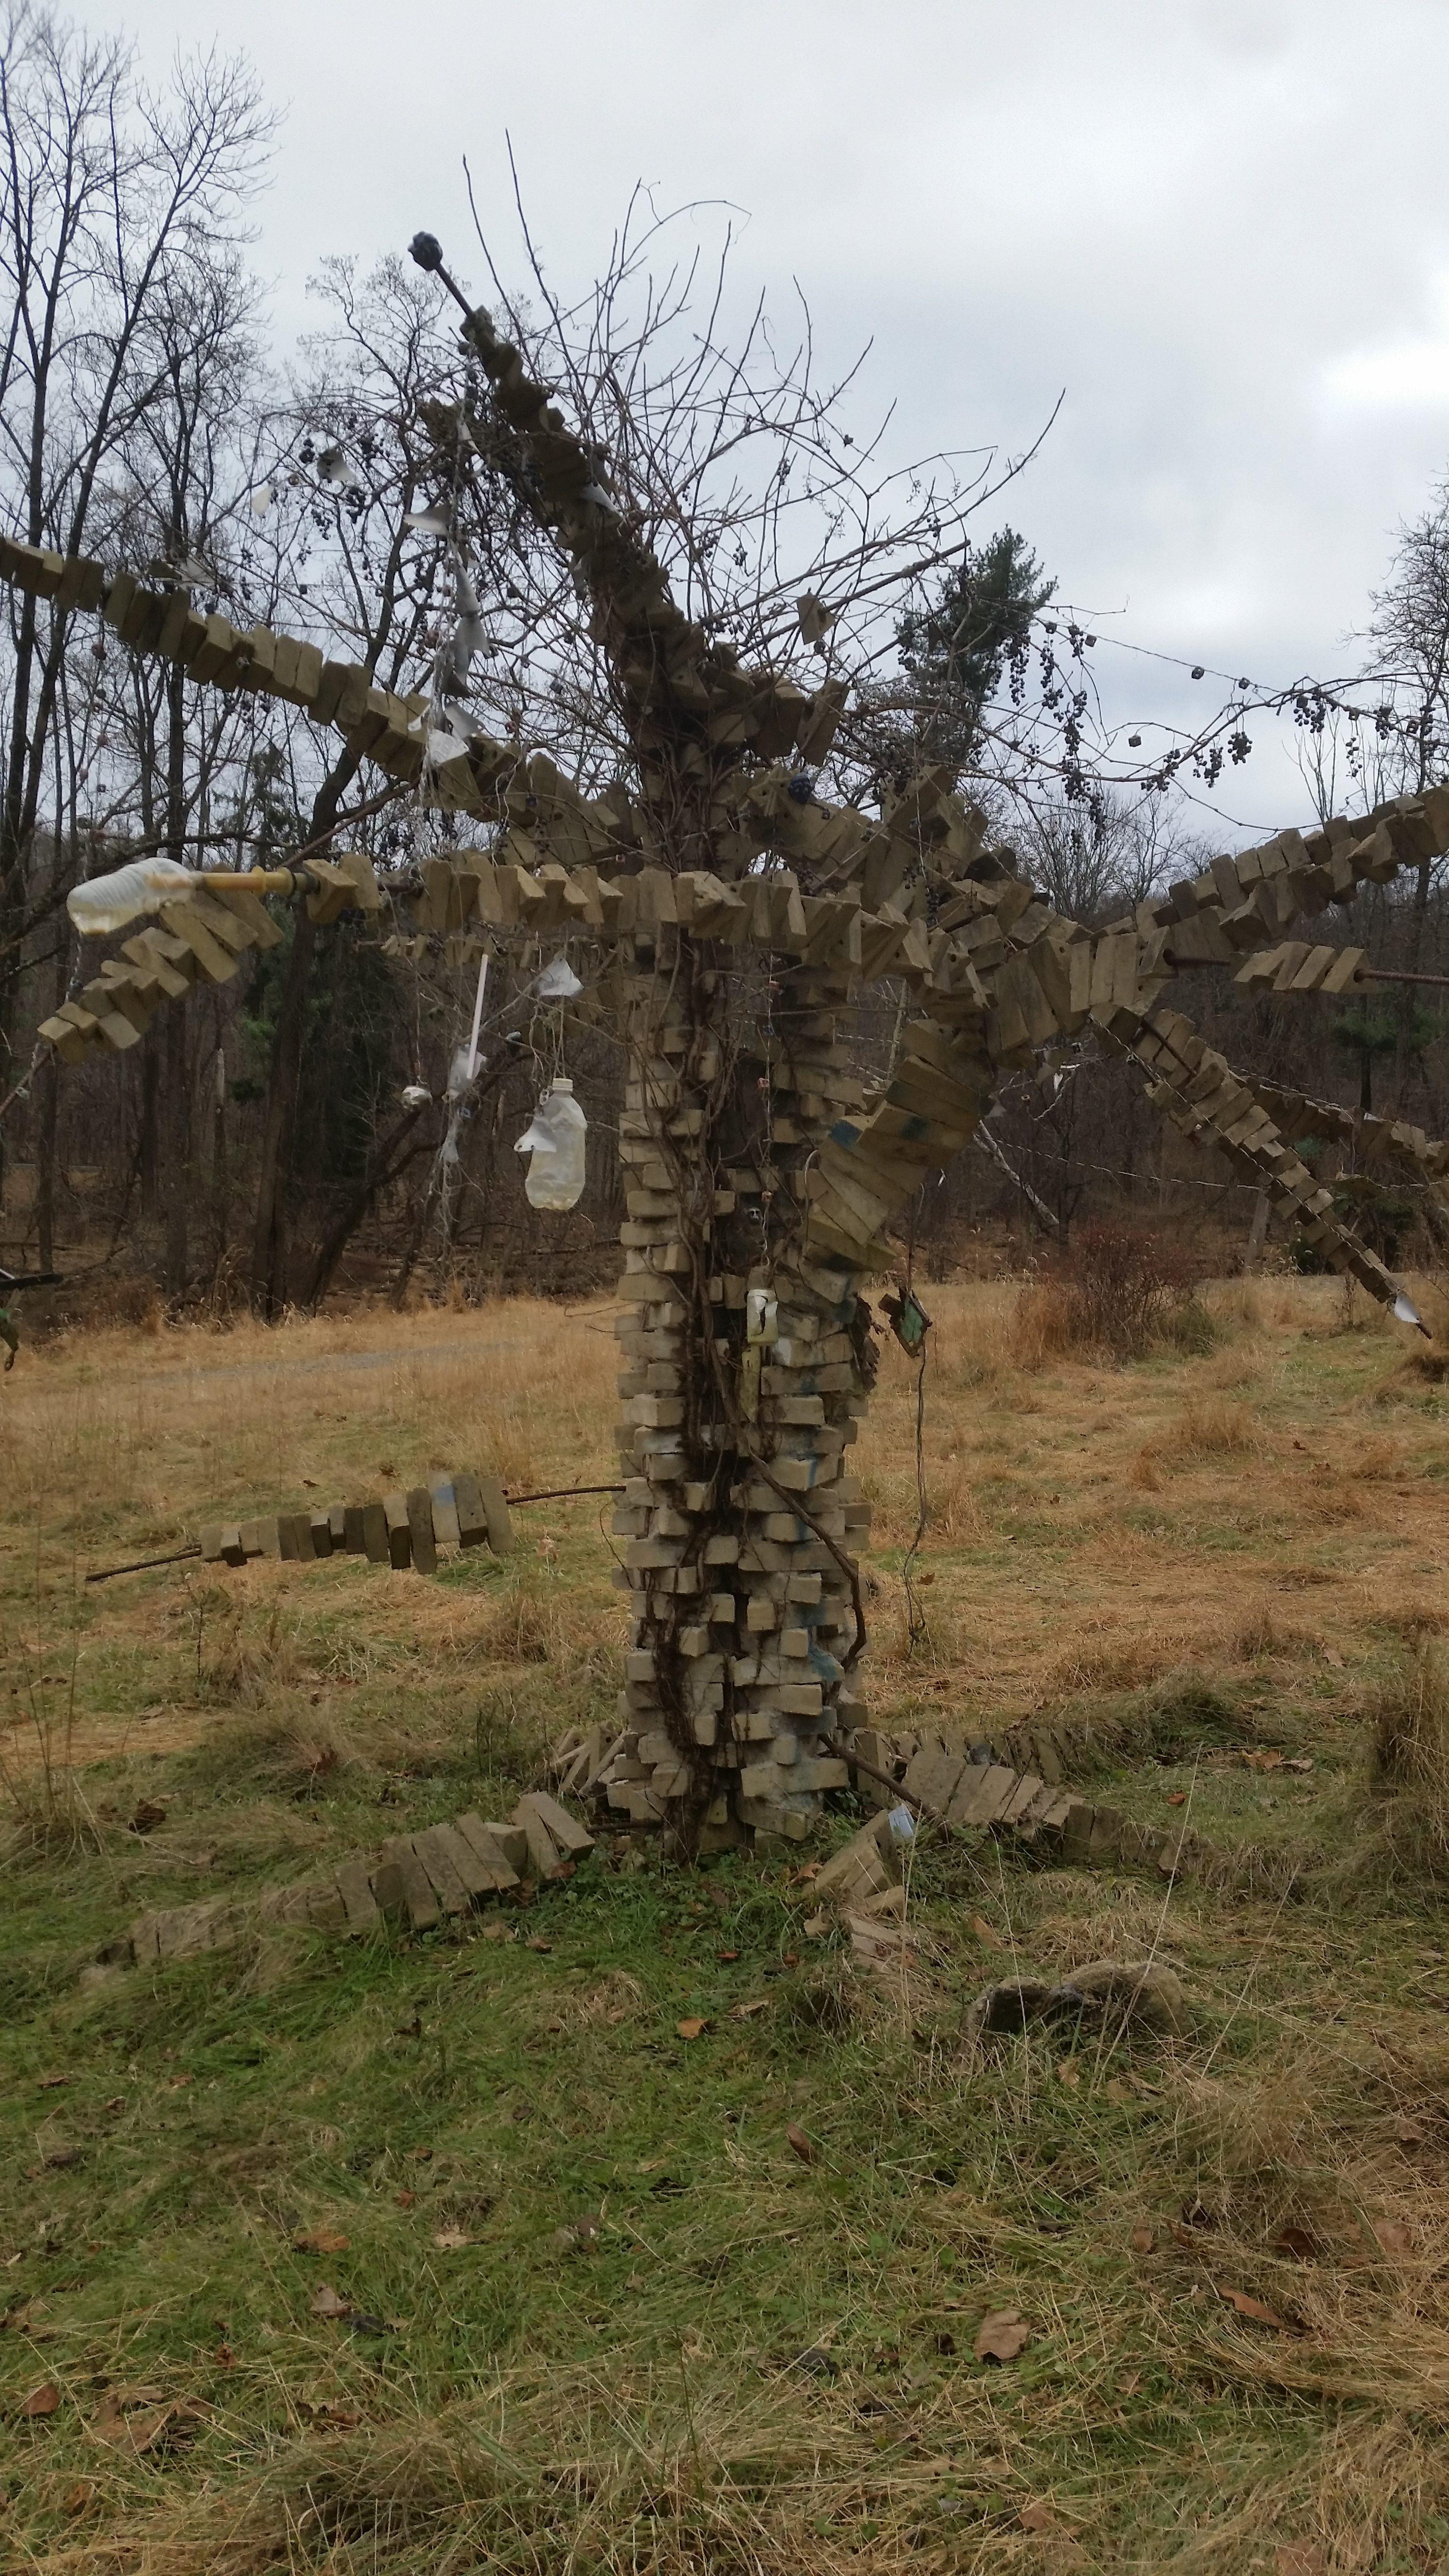 brick tree sculpture